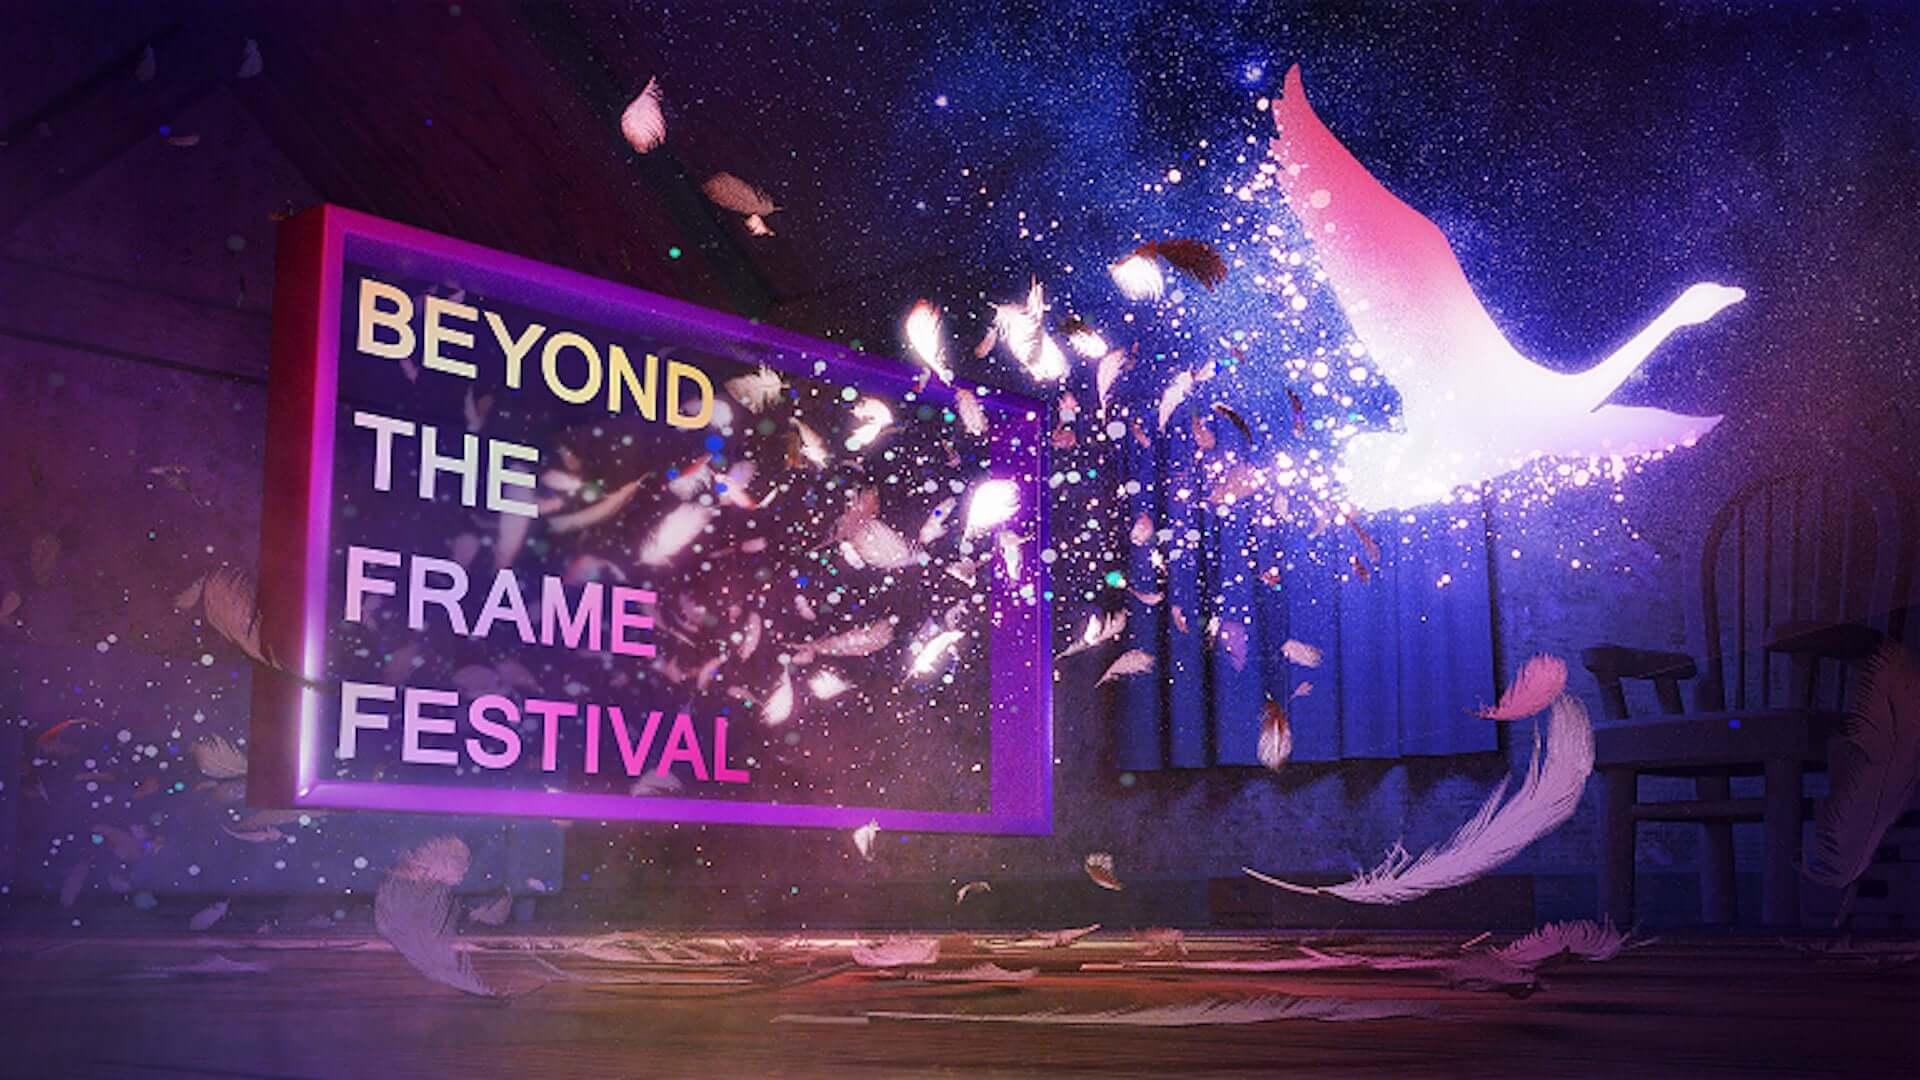 VR映画に特化した国際映画祭<Beyond The Frame Festival>がオンラインで開催決定!審査員は園子温、大宮エリー、福田淳 film210120_btff_1-1920x1080